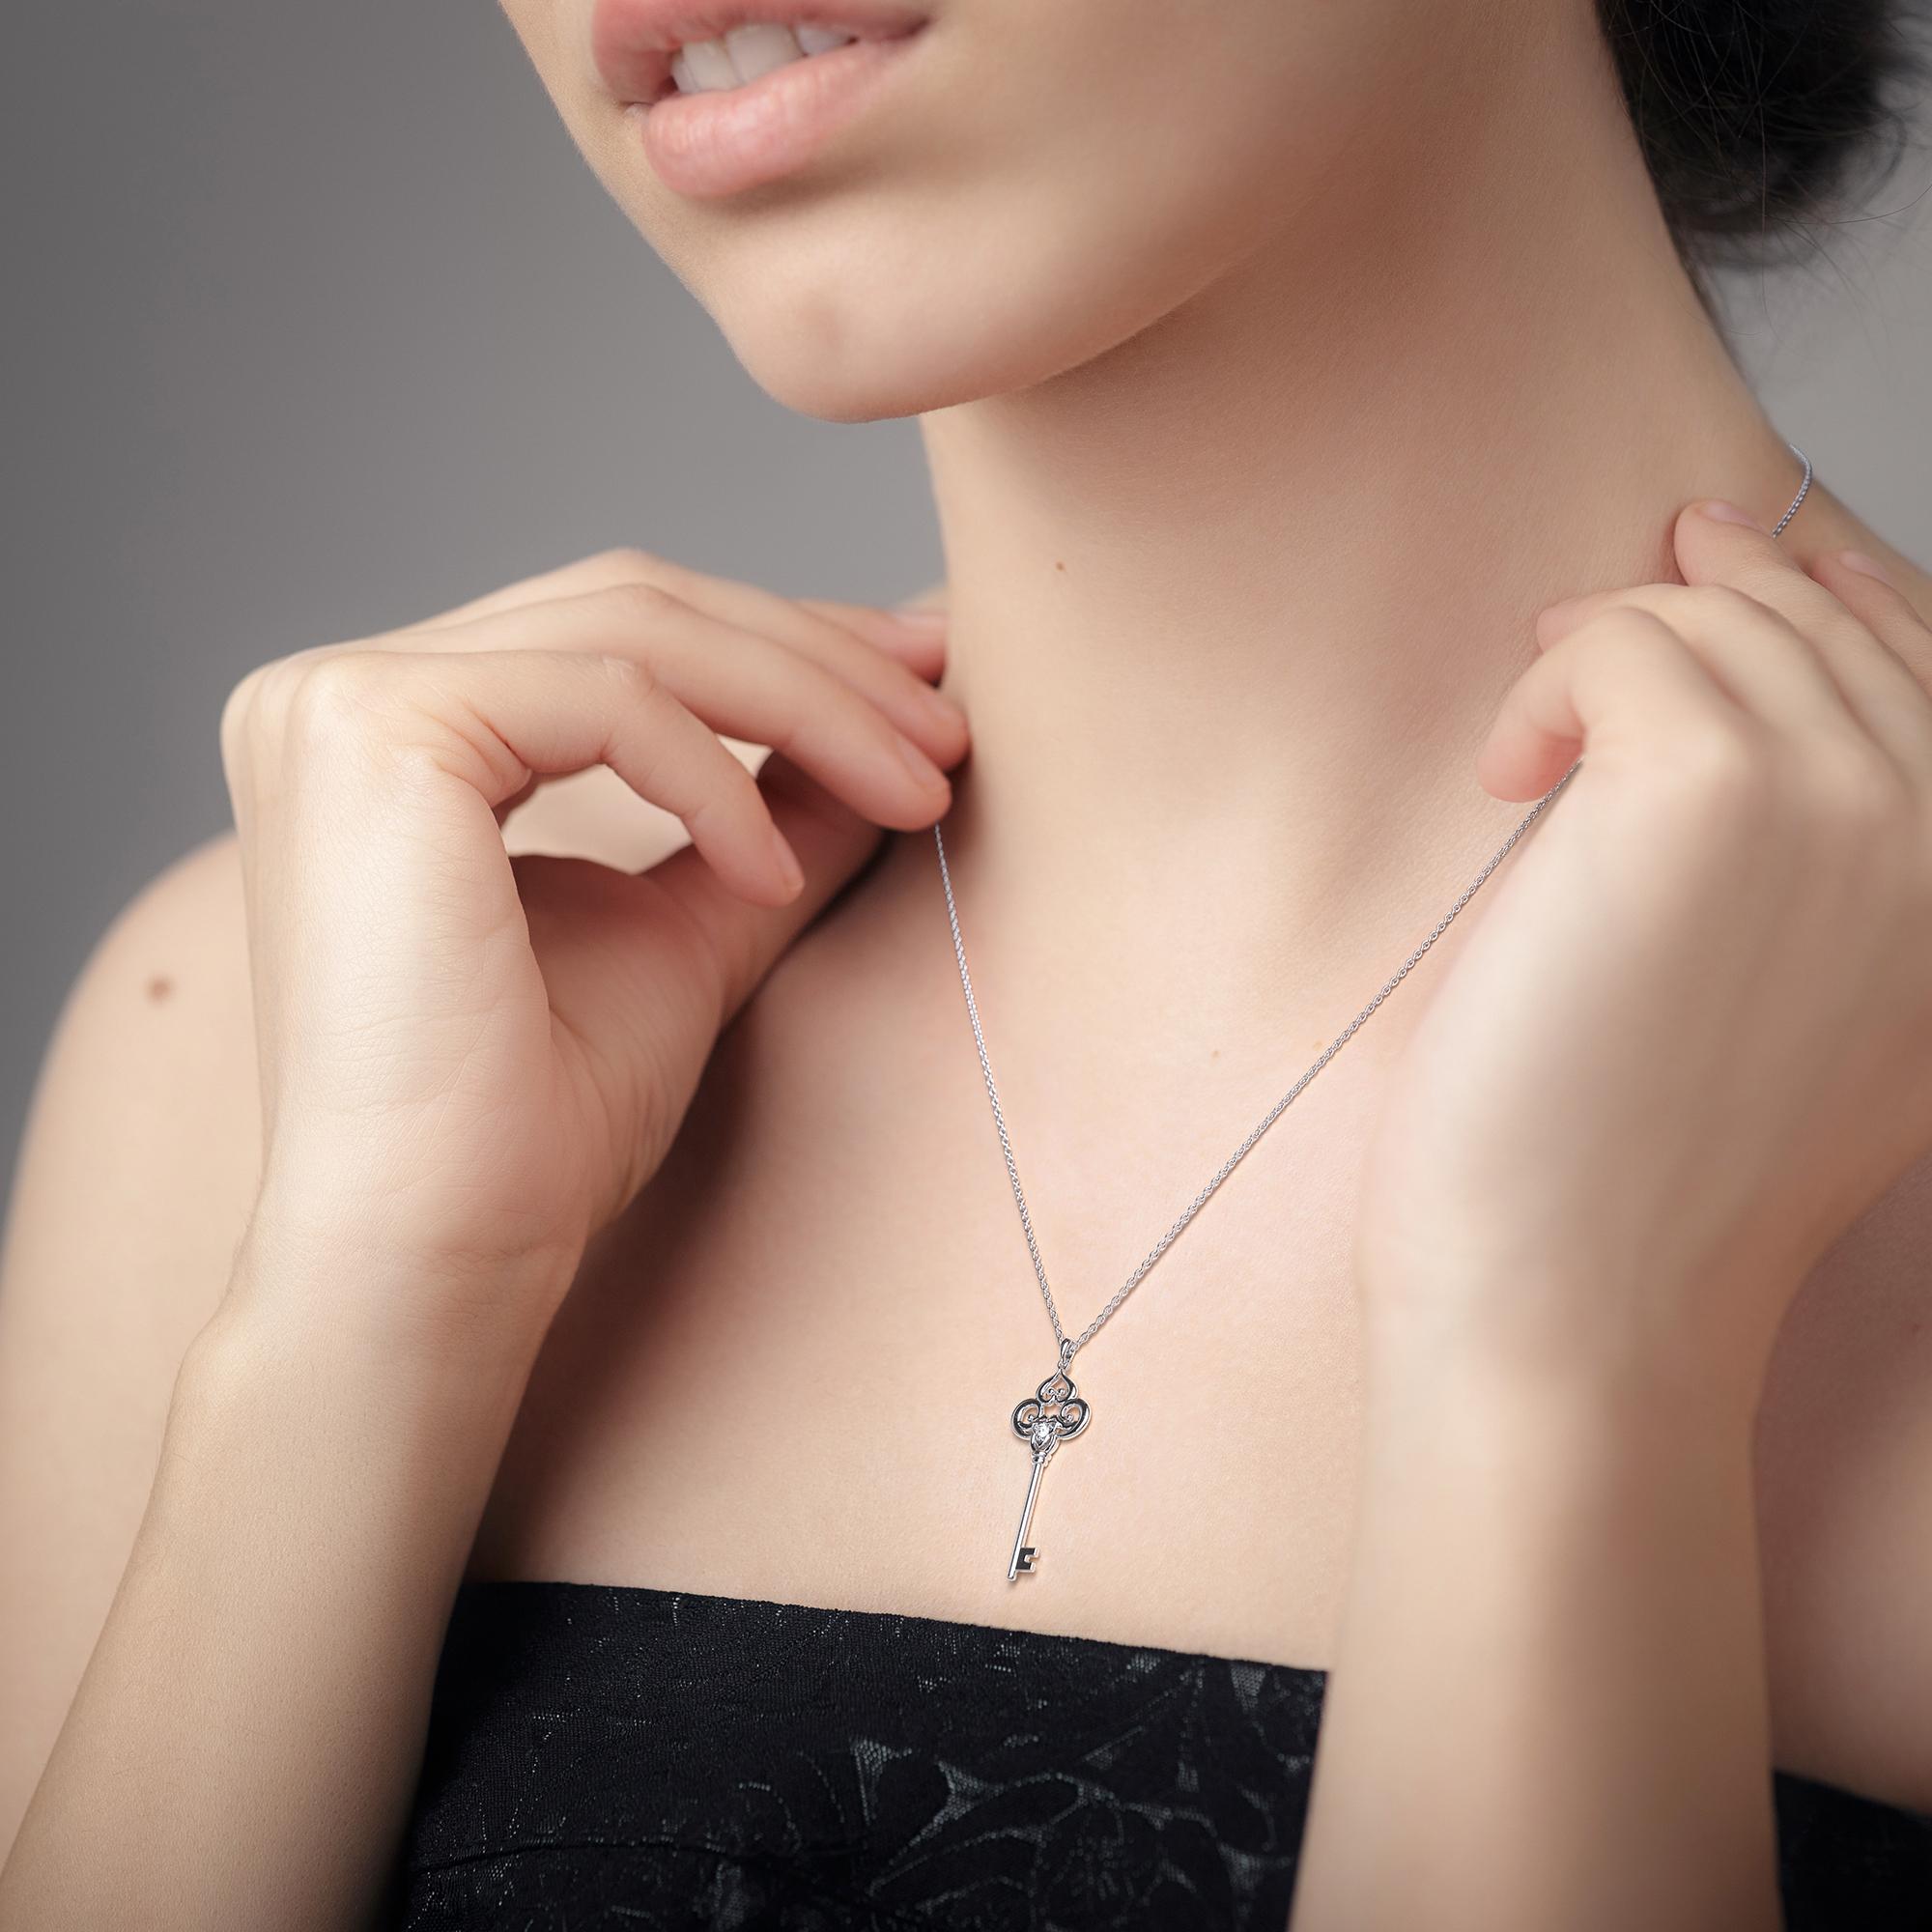 14K White Gold Pendant Diamond Key Pendant Clover Key Pendant Necklace Unique Gift For Women